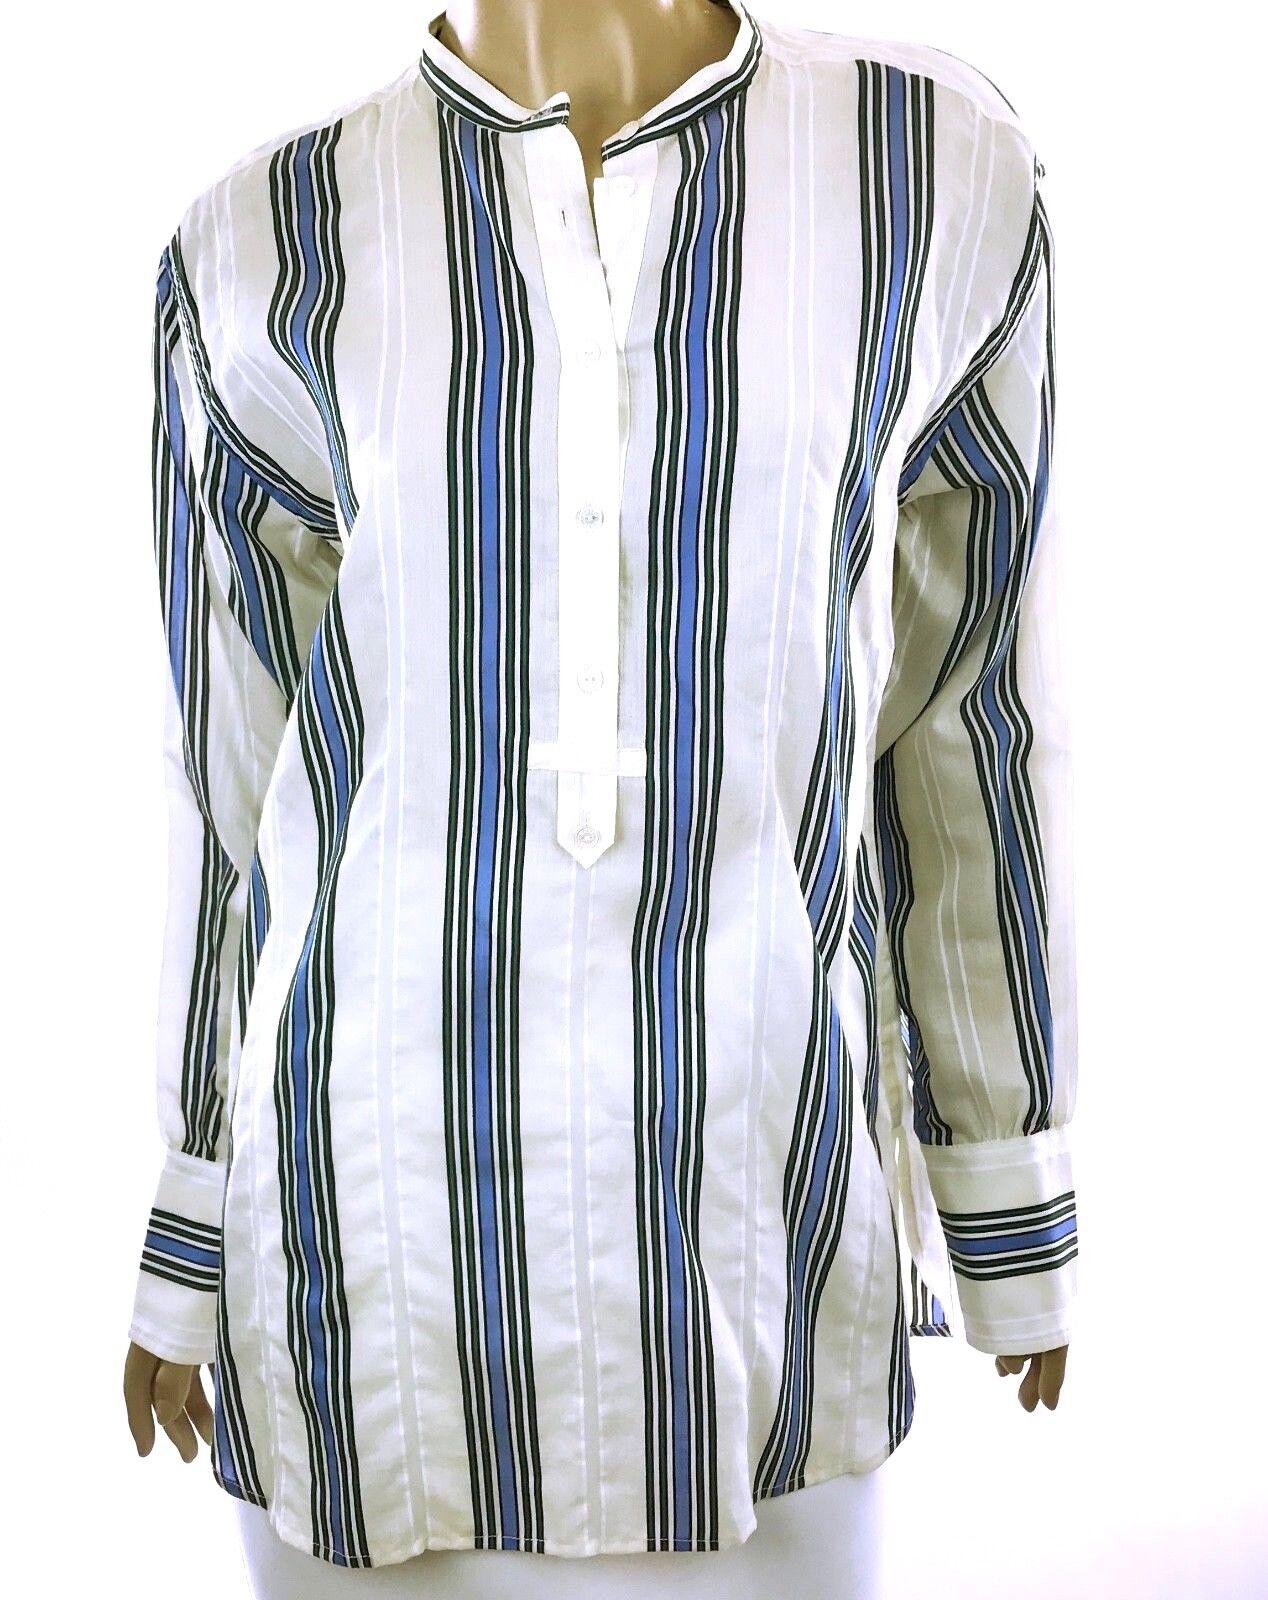 Vince New Größe 4 Tunic Top Blouse Weiß Blau Stripe Cotton Blend Long Sleeves